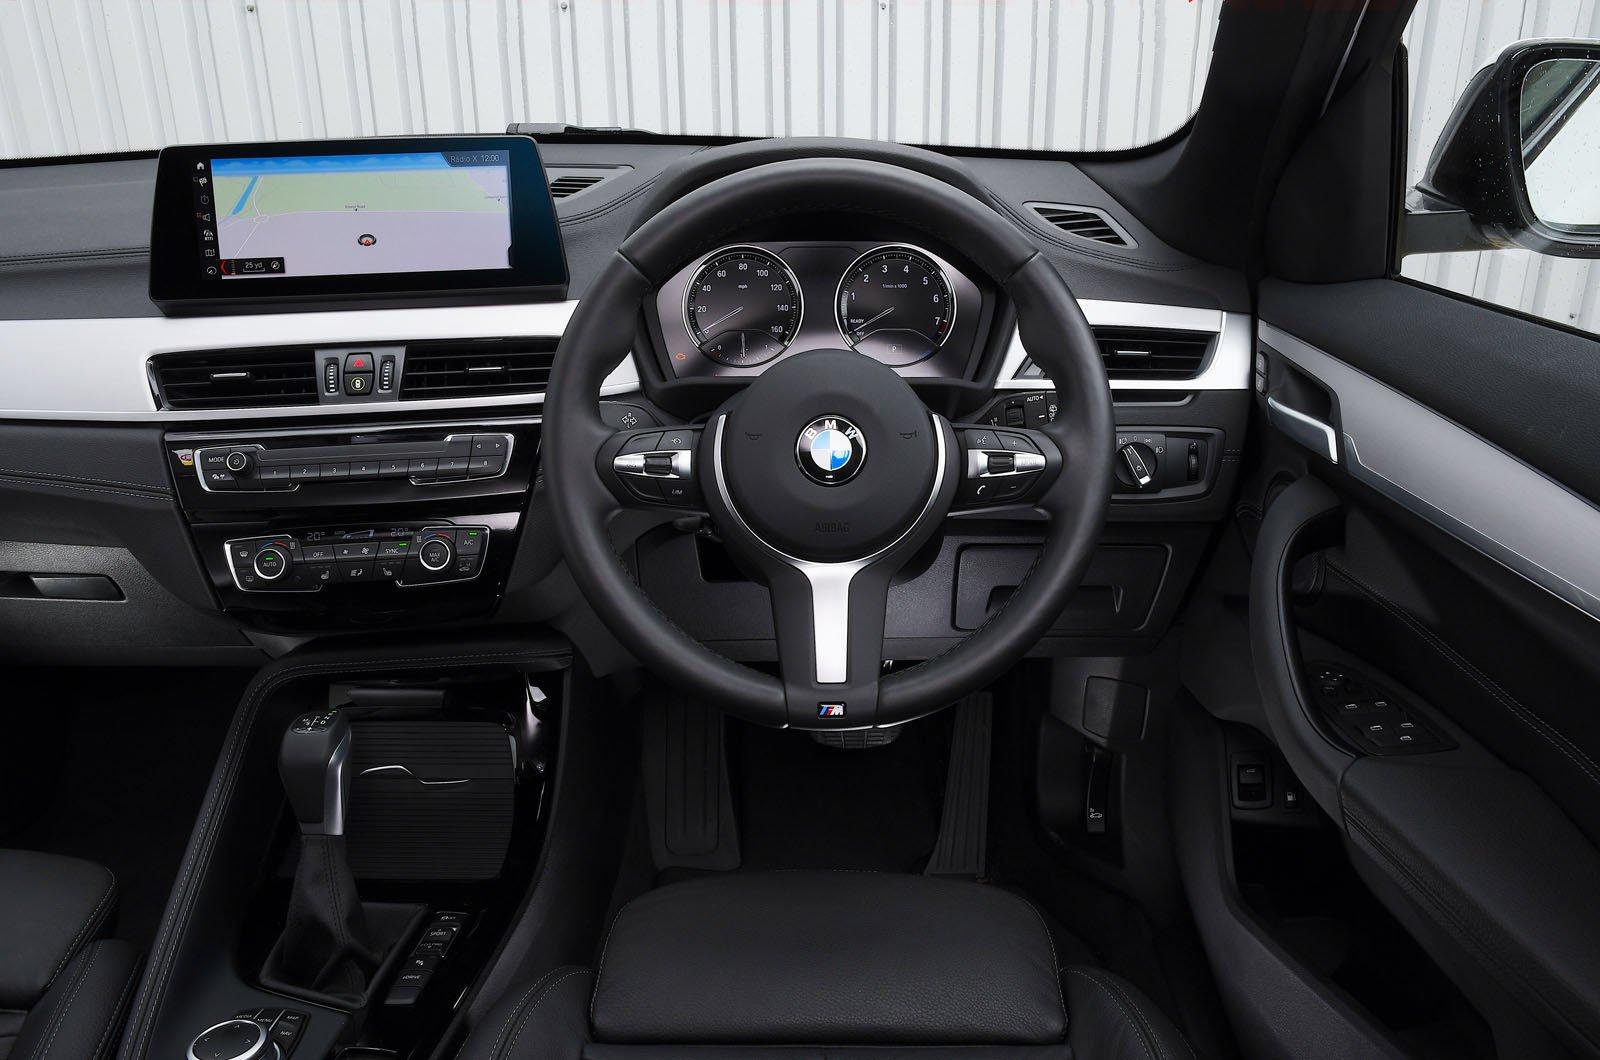 BMW X1 xDrive25e 2021 dashboard